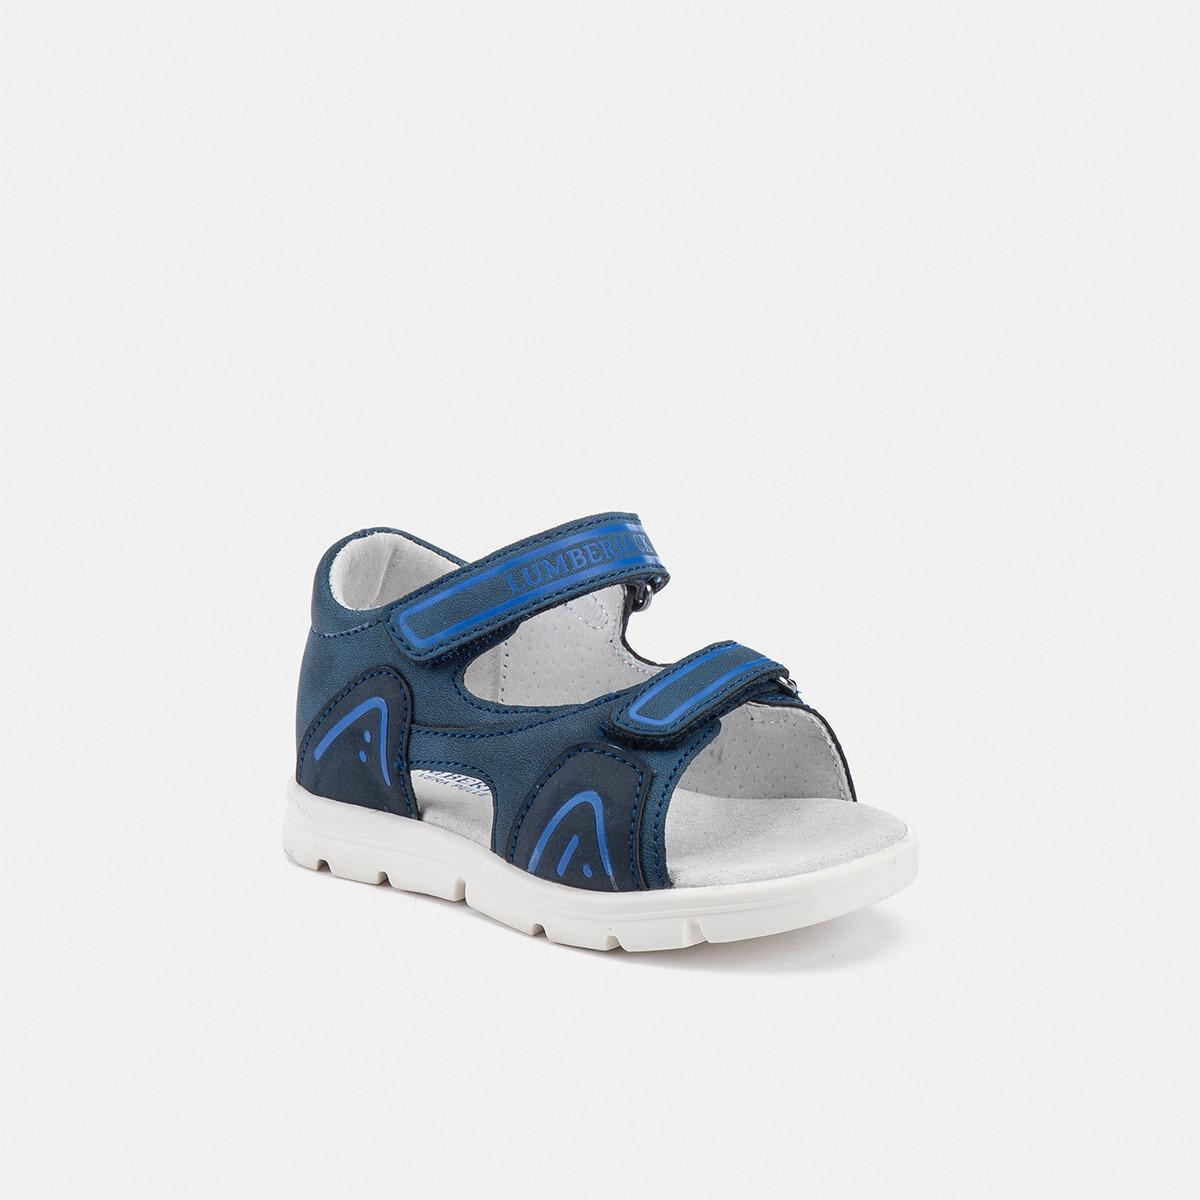 WHIPPY NAVY BLUE Boy Sandals